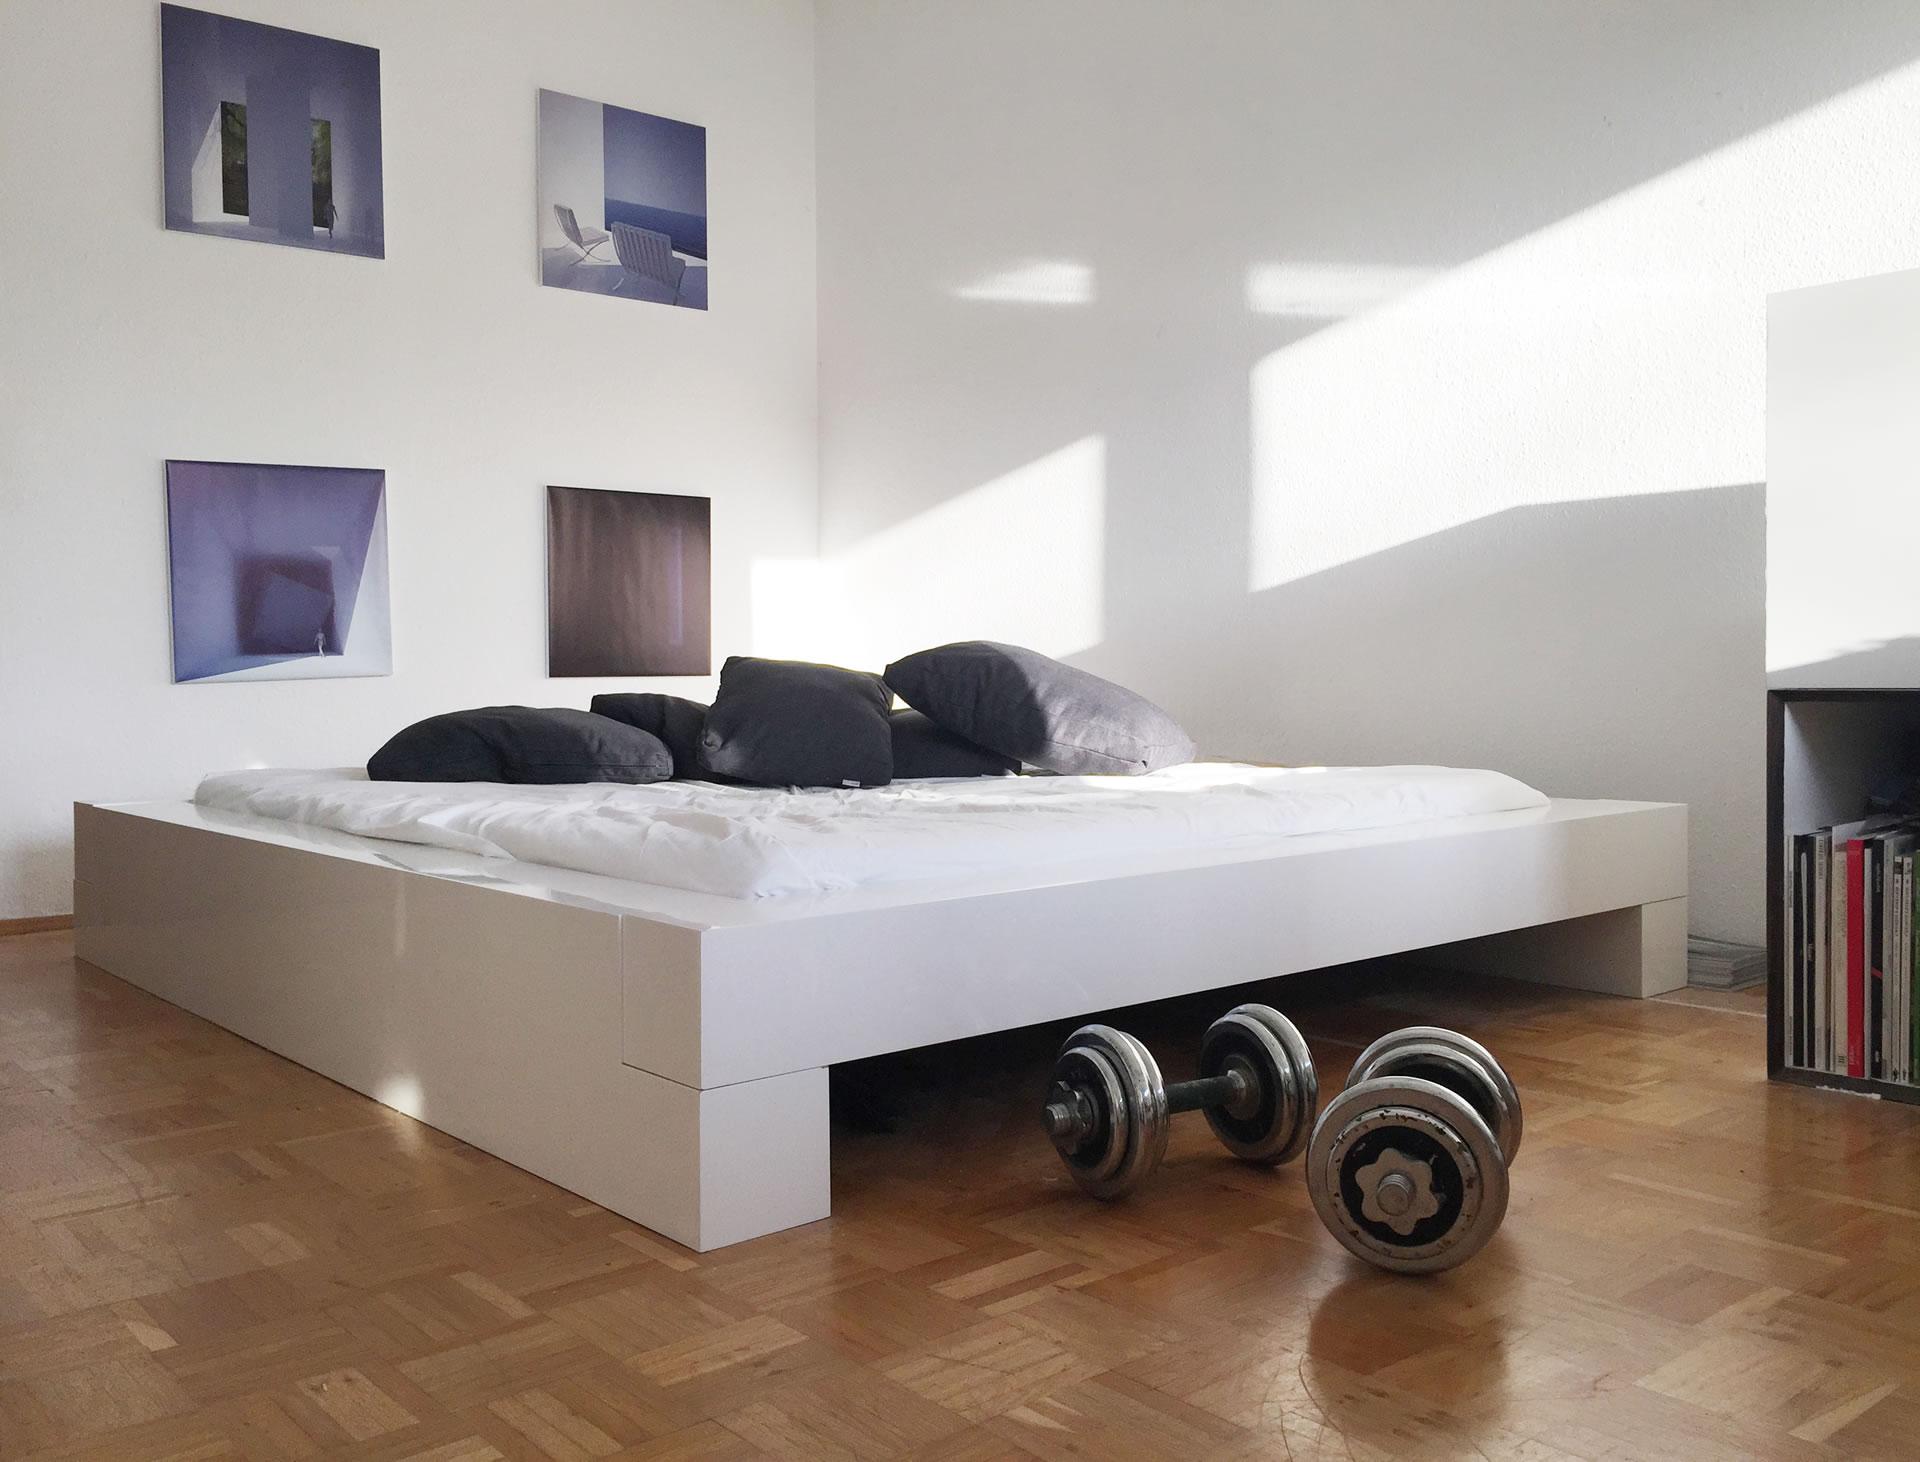 Full Size of Kopfteil Bett 140 Runde Betten Bei Ikea 180x200 Bettkasten Minion Clinique Even Better Make Up Modernes Weiß Mit Aufbewahrung 90x200 100x200 Günstige Bette Bett Bett Flach